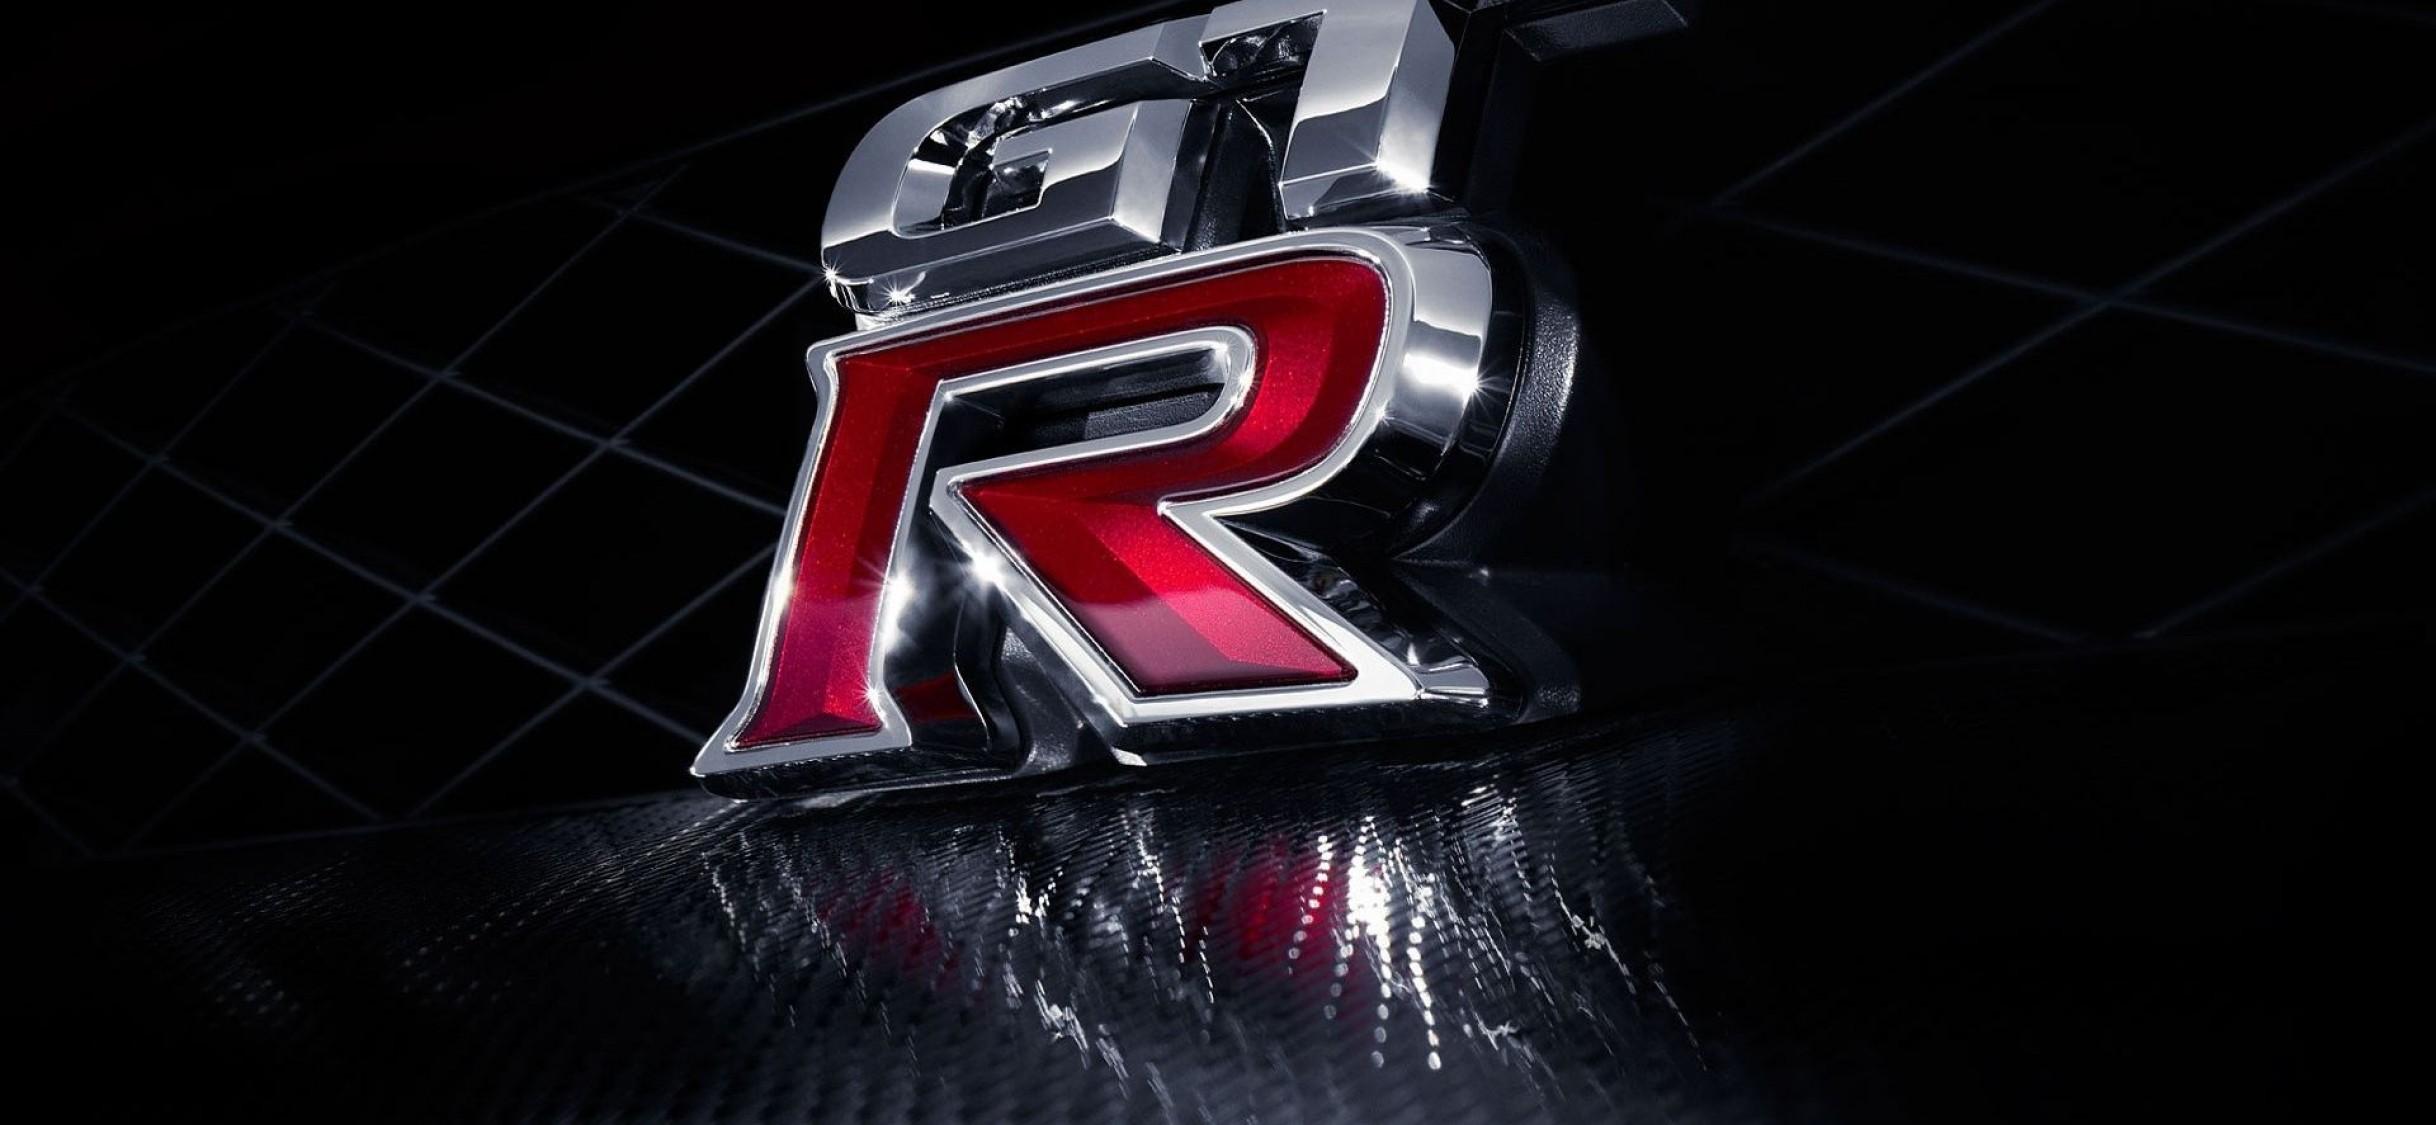 Nissan Gt R Badge Logo Wallpaper For Desktop And Mobiles